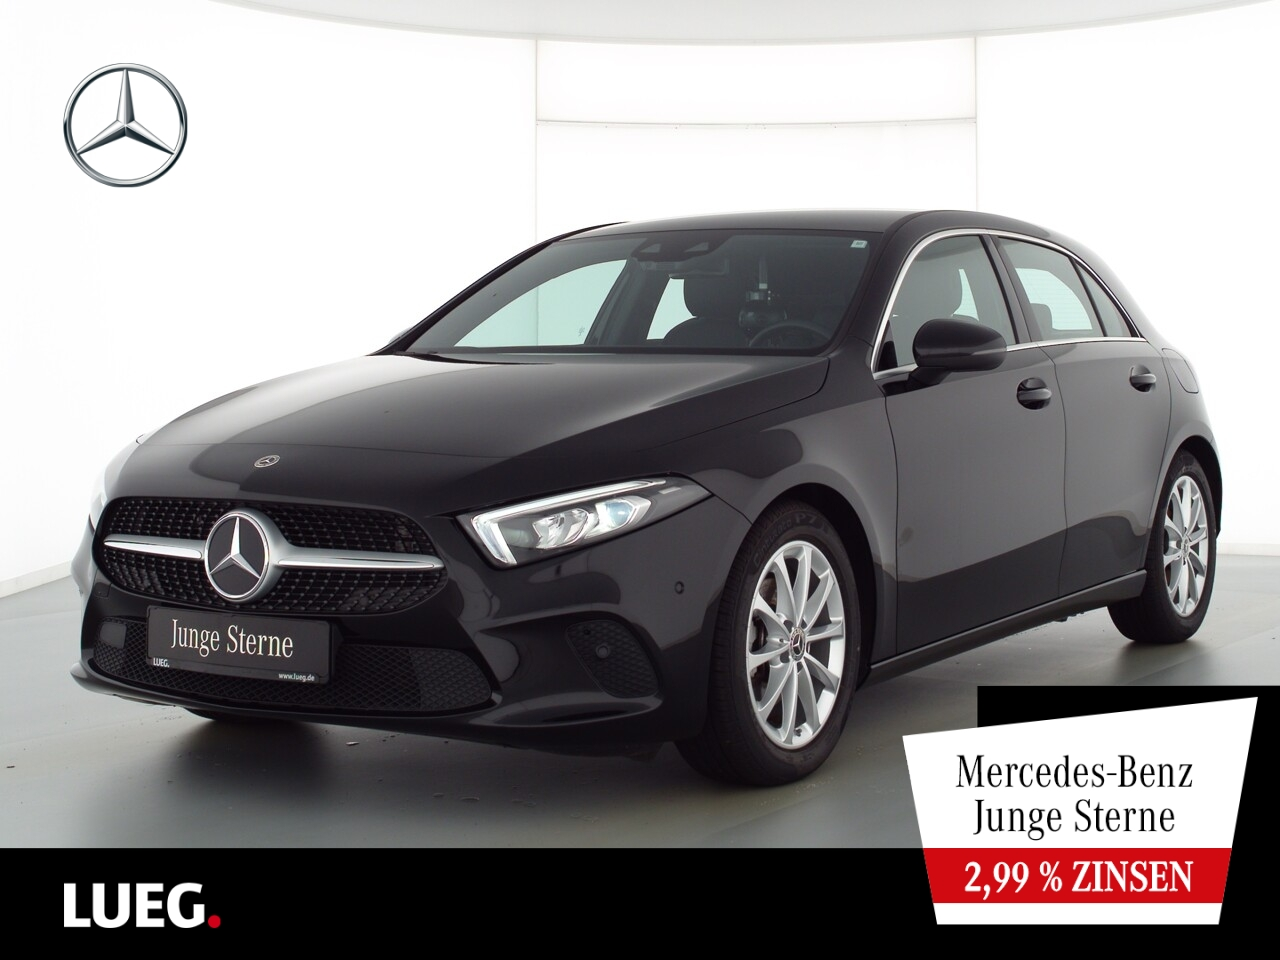 Mercedes-Benz A 180 Progressive+MBUXHighEnd+LED-HP+AParkAssist, Jahr 2020, Benzin